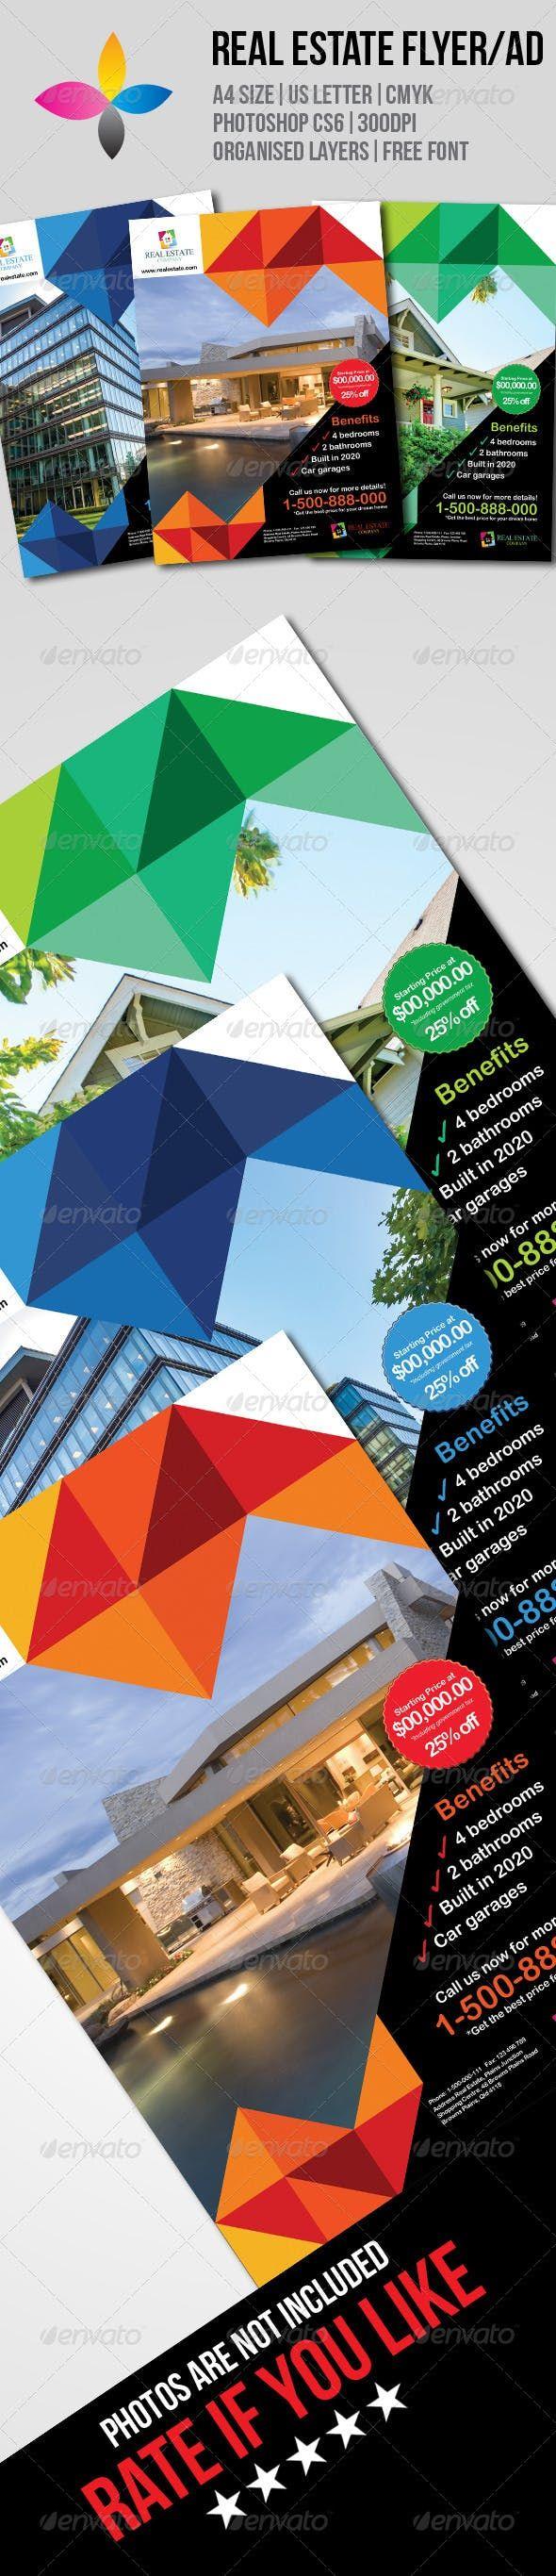 real estate flyer  ad  u2014 photoshop psd  photoshop  land